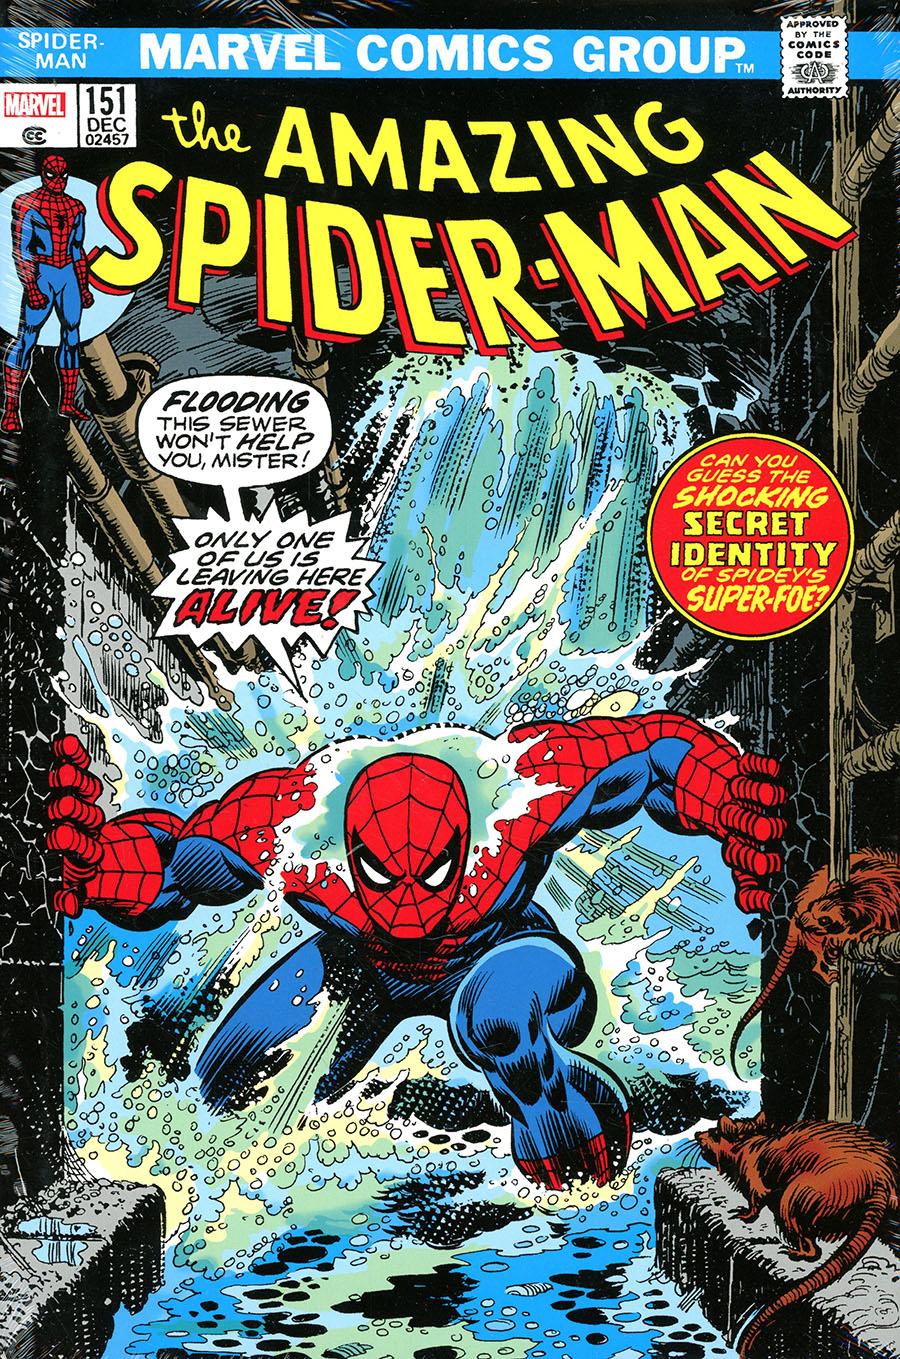 Amazing Spider-Man Omnibus Vol 5 HC Direct Market Gil Kane Variant Cover